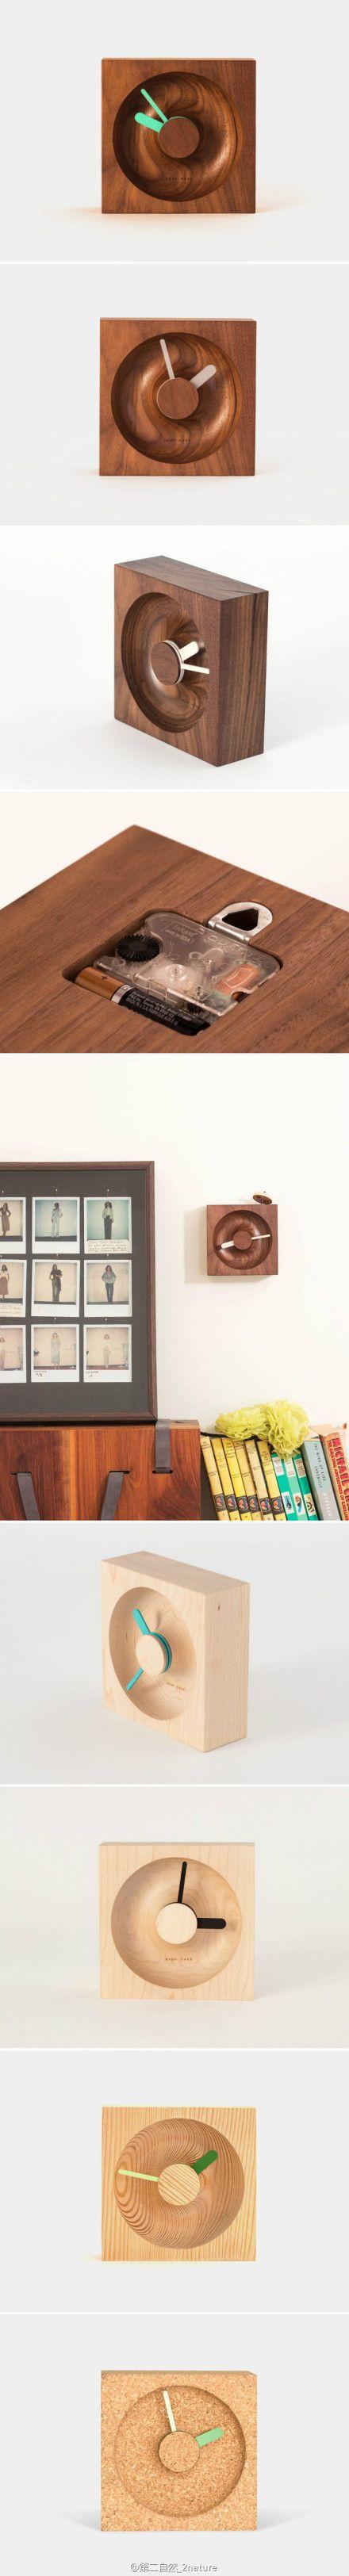 O时钟是位于洛杉矶的OKUM MADE 设计品牌设计。这一系列体现了木材自然美感,以及木材岁月时间的特质,刚好与时钟不谋而合。还有100%的回收软木款。每一件产品都是手工精心制作,OKUM MADE 品牌旨在努力创造有意义的对象,体现现代工艺和纯度。